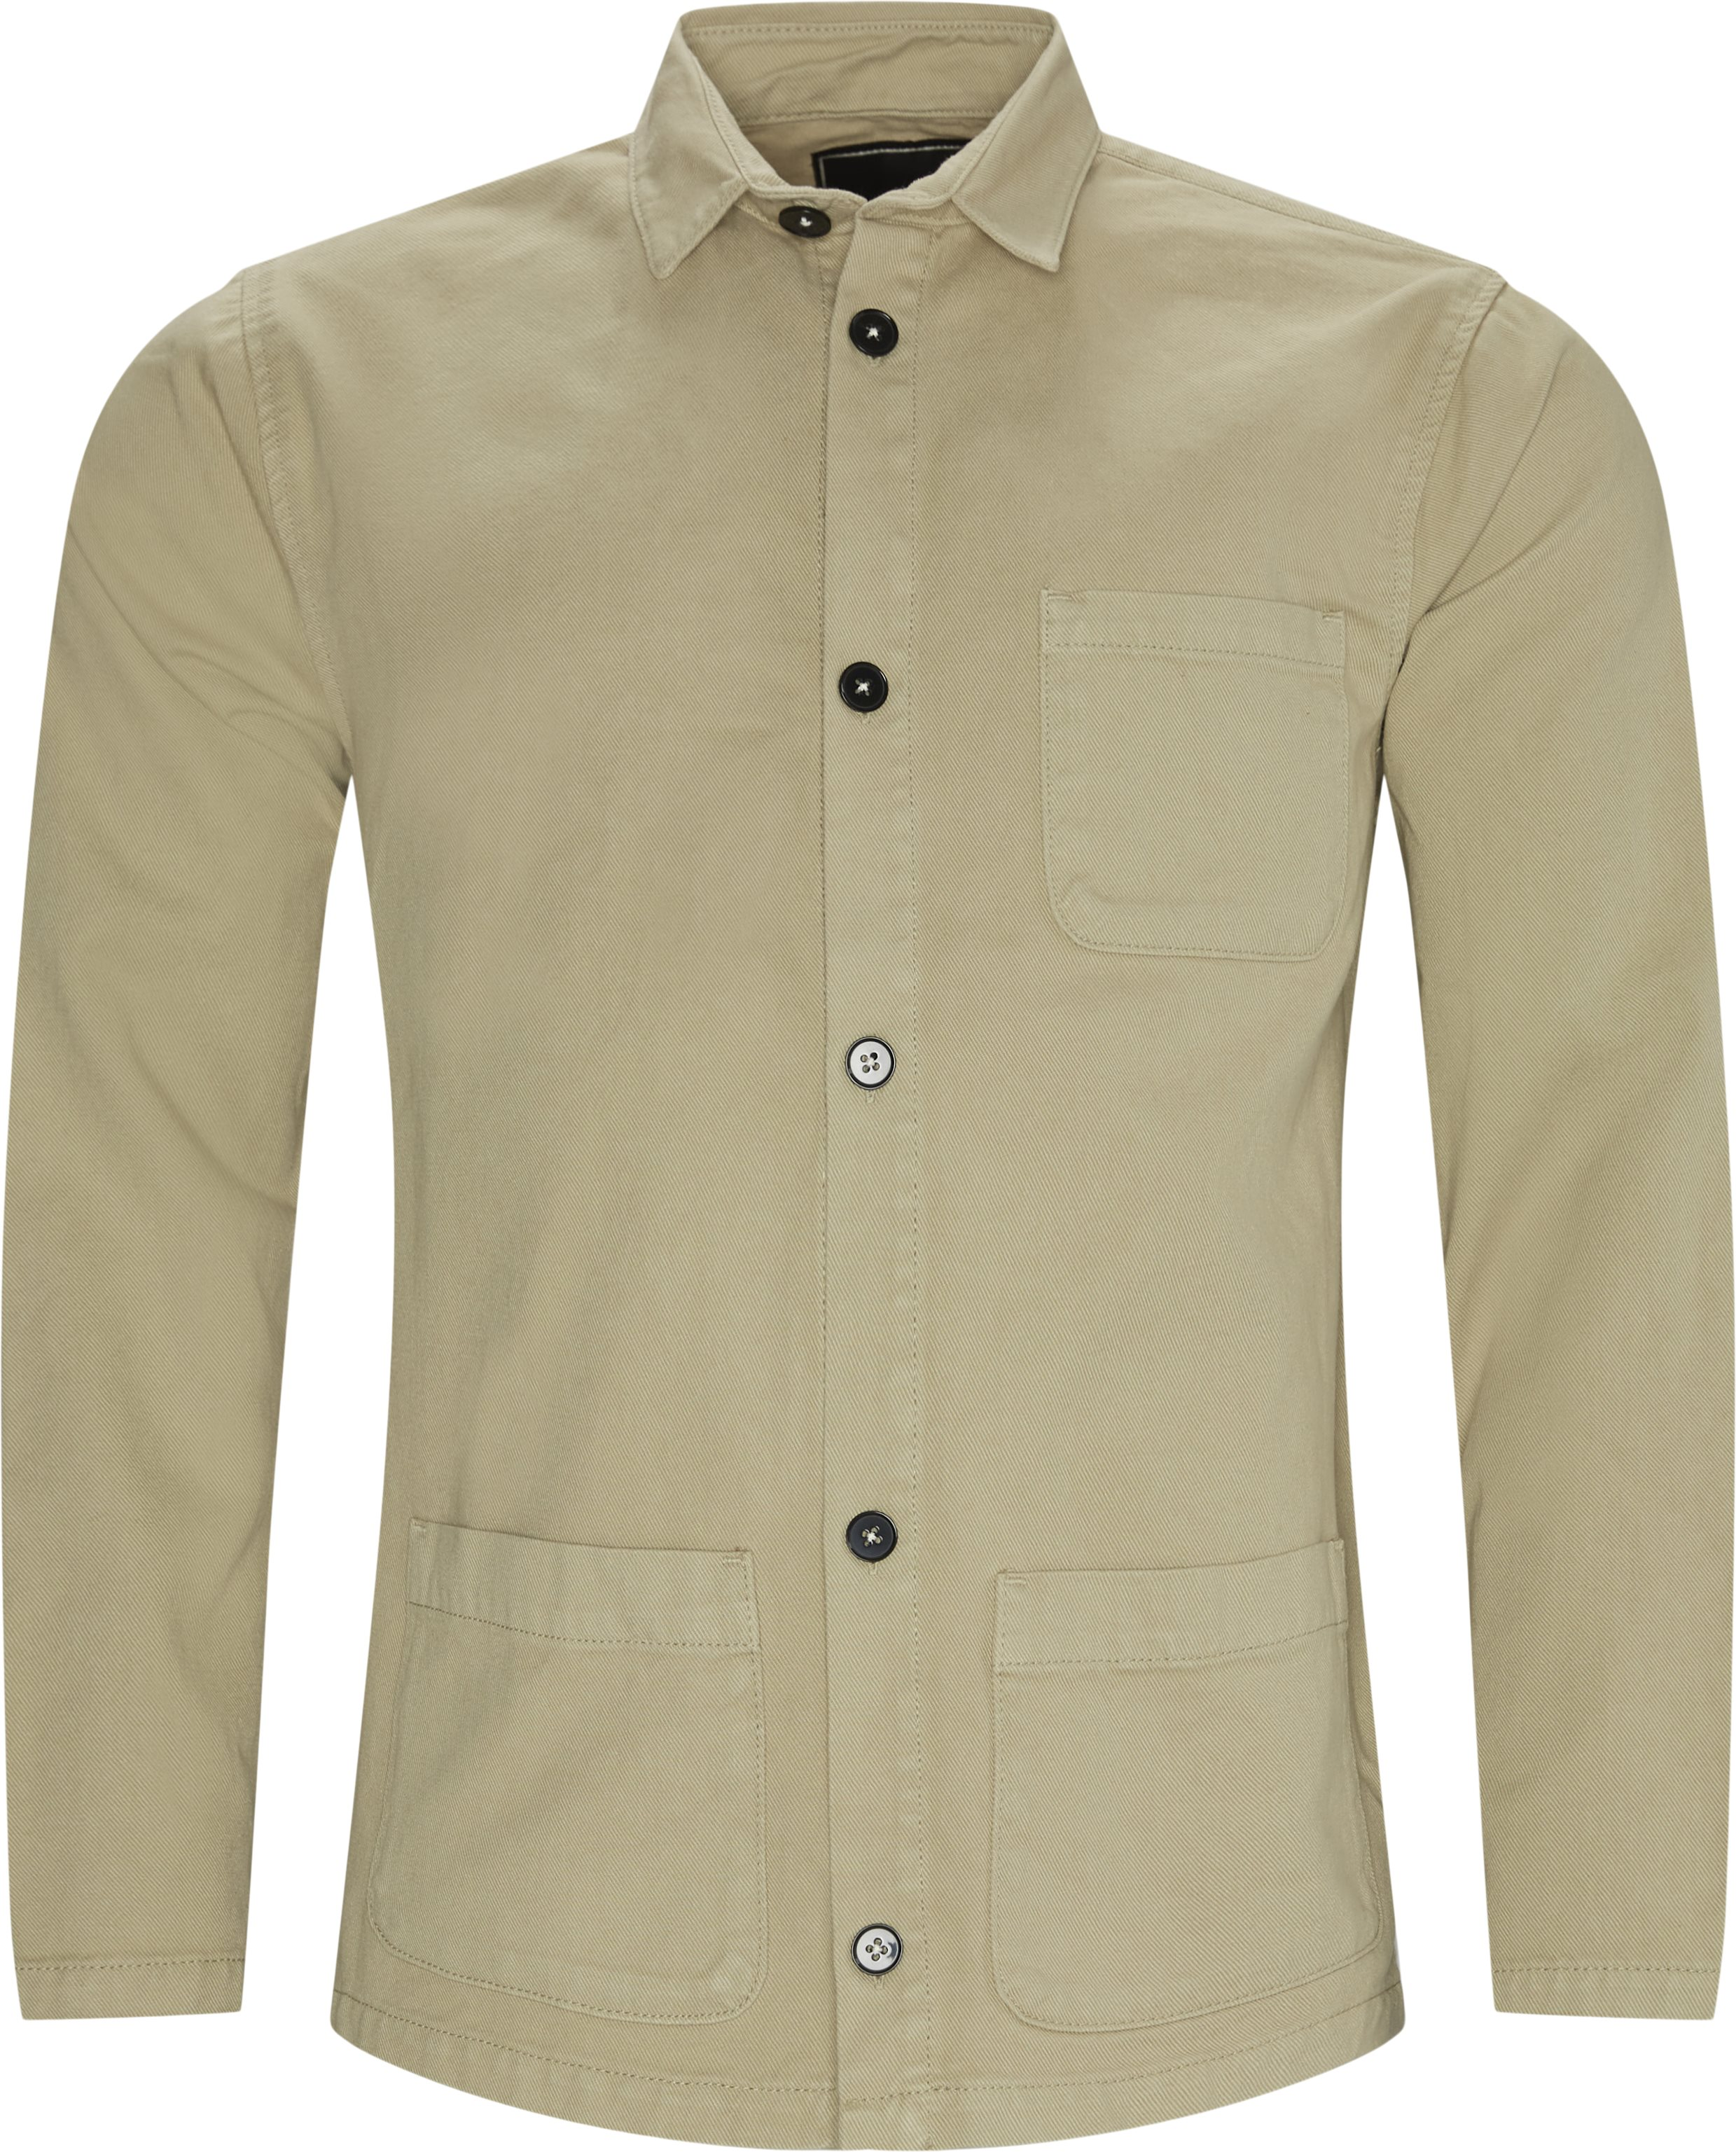 Shirts - Regular fit - Sand